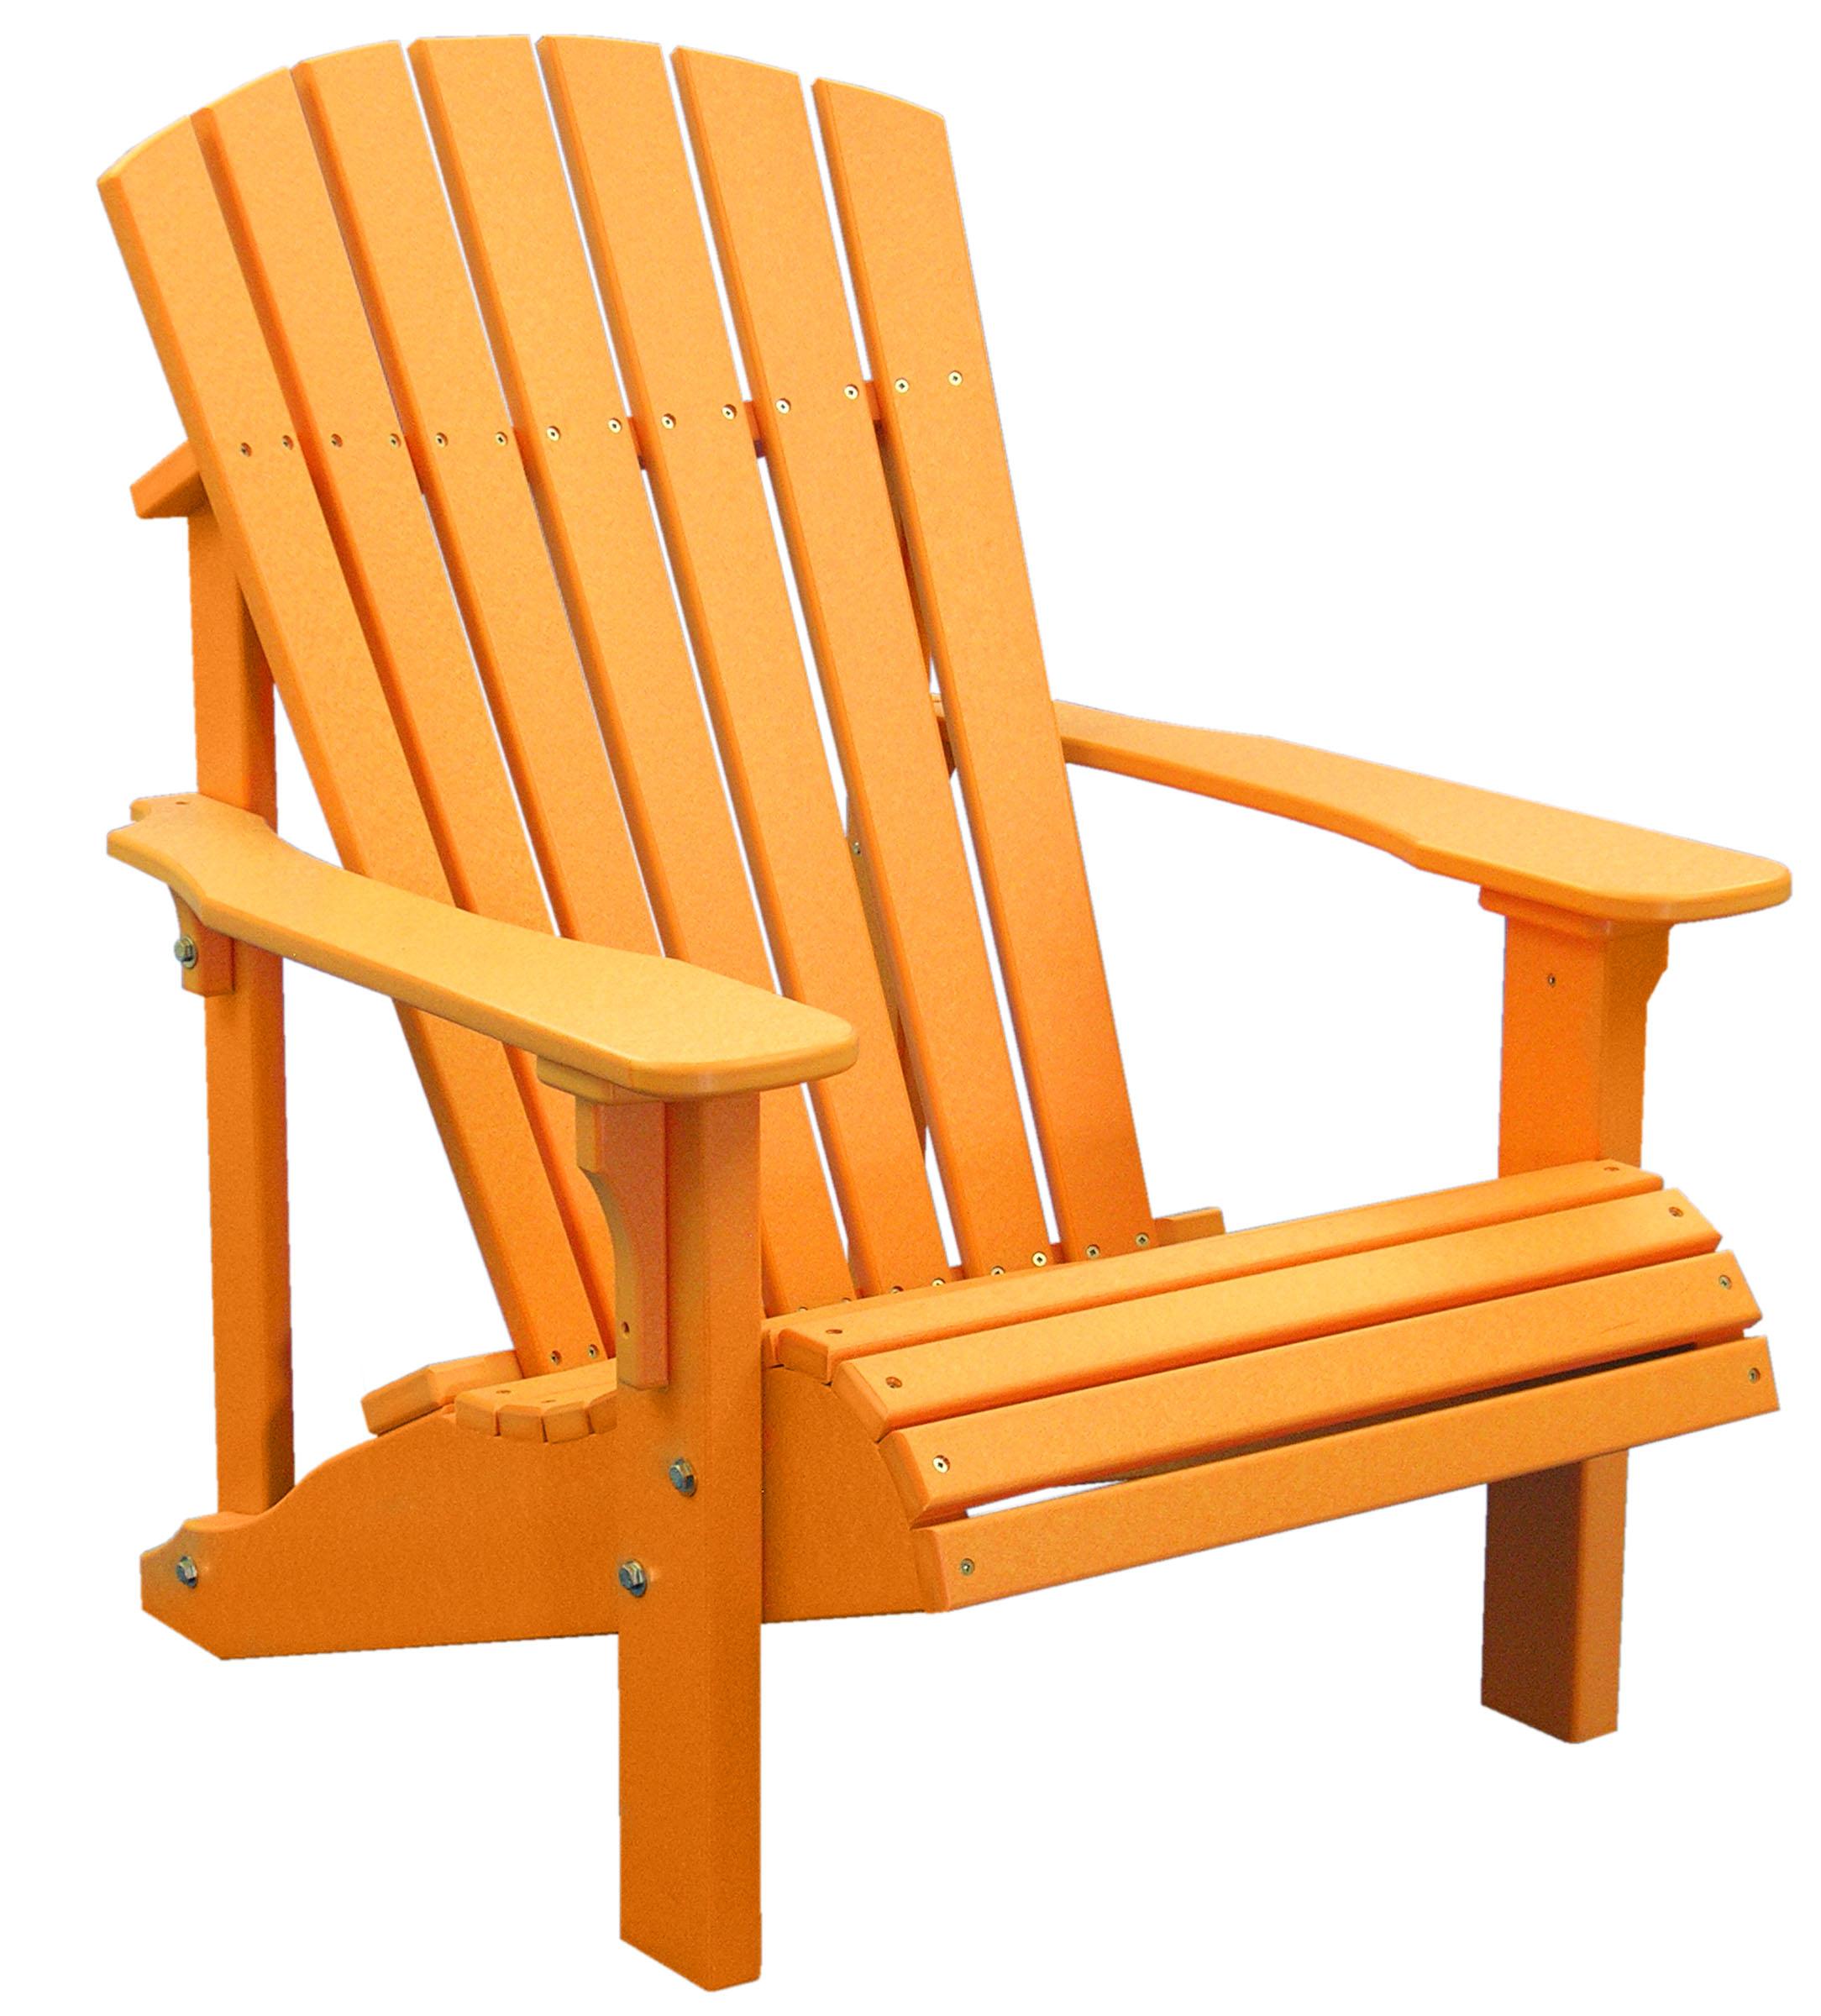 deck chairs deluxe-adirondack-chair-tangerine NXNIRZN